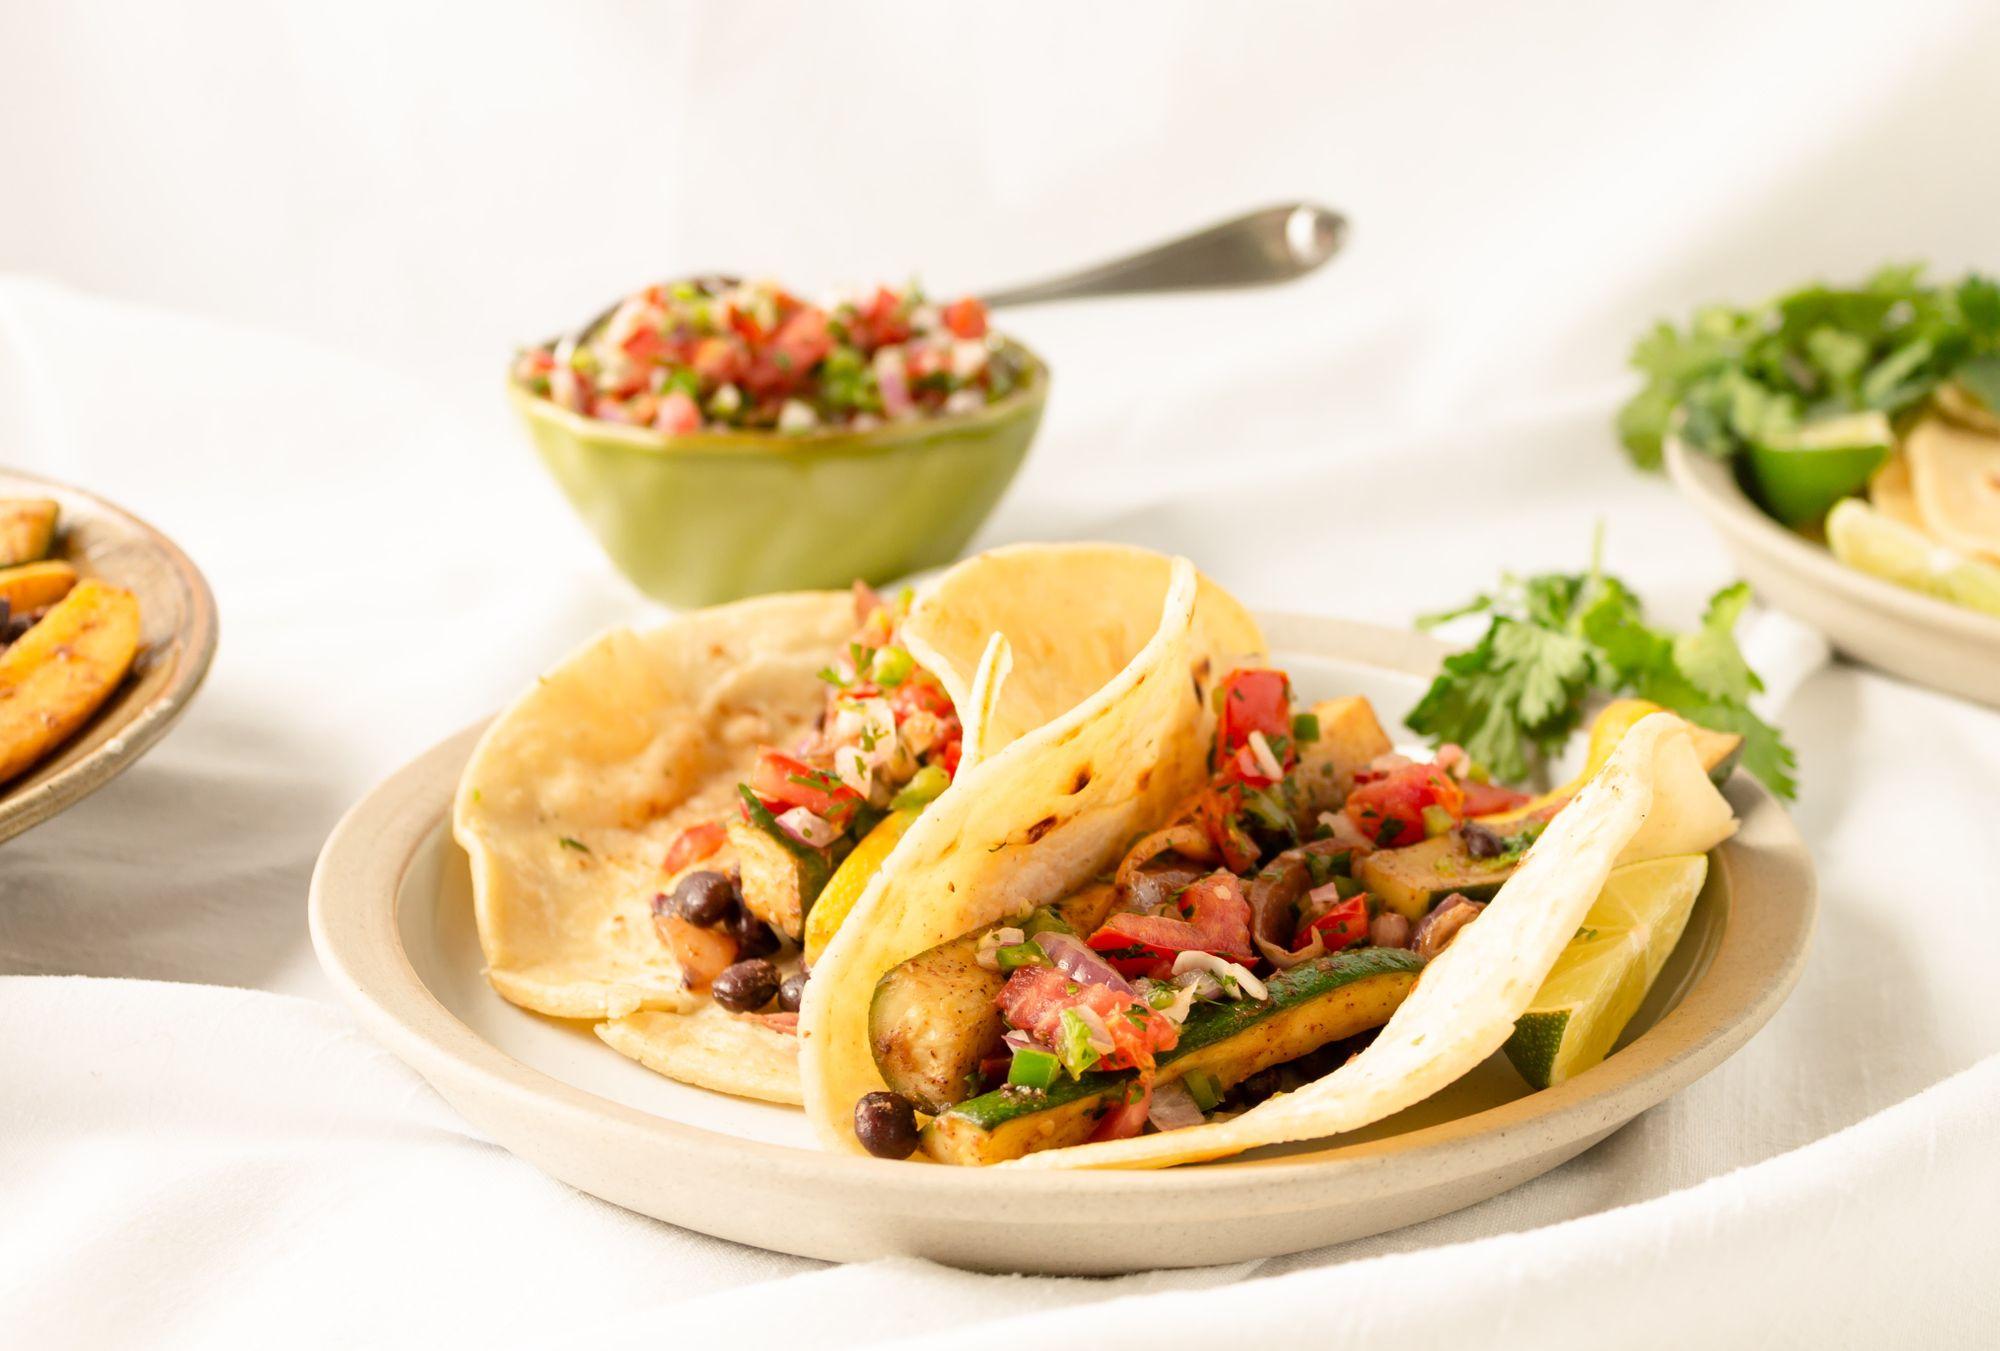 Vegan zucchini and black bean tacos